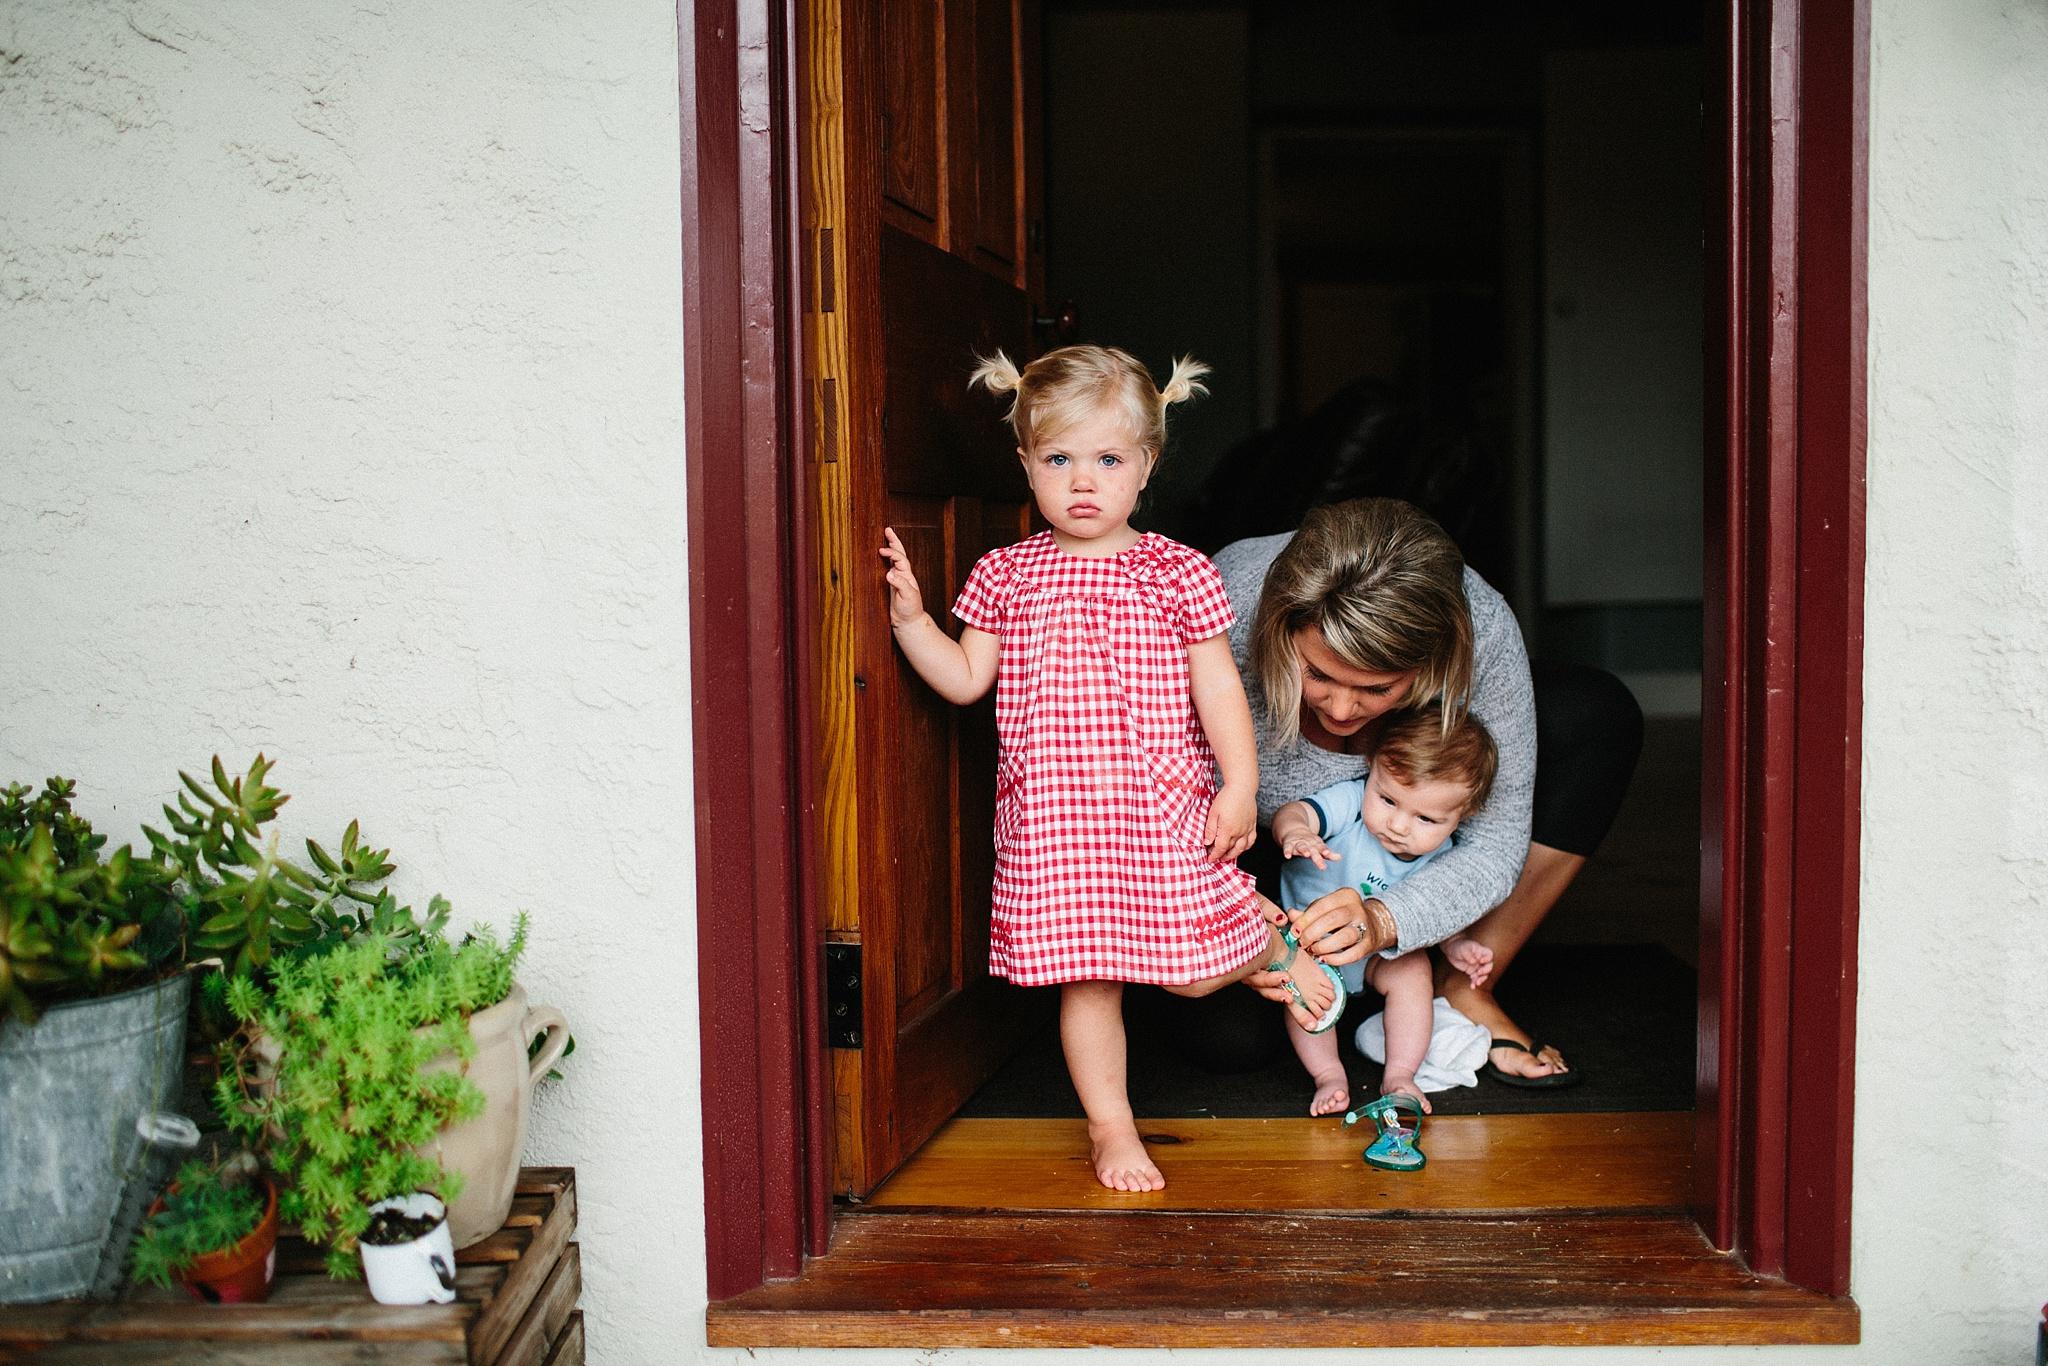 KellyLappPhotography_familyphotojournalism_inhomesession_Lancasterfamilyphotographer_Ranck_38.JPG